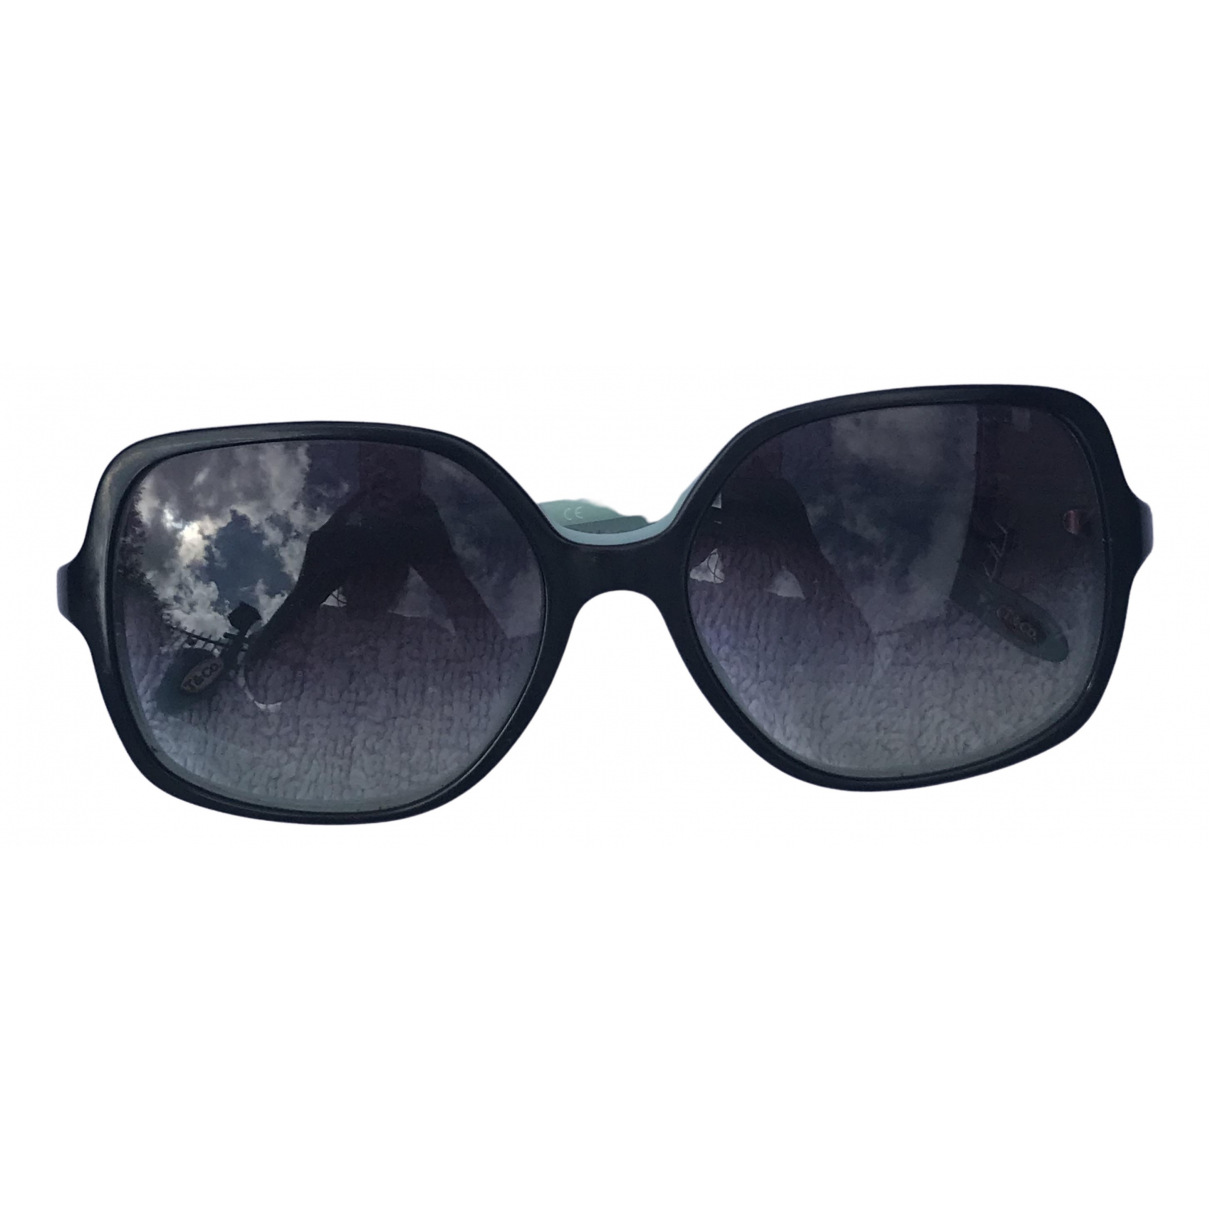 Tiffany & Co \N Sonnenbrillen in  Schwarz Kunststoff